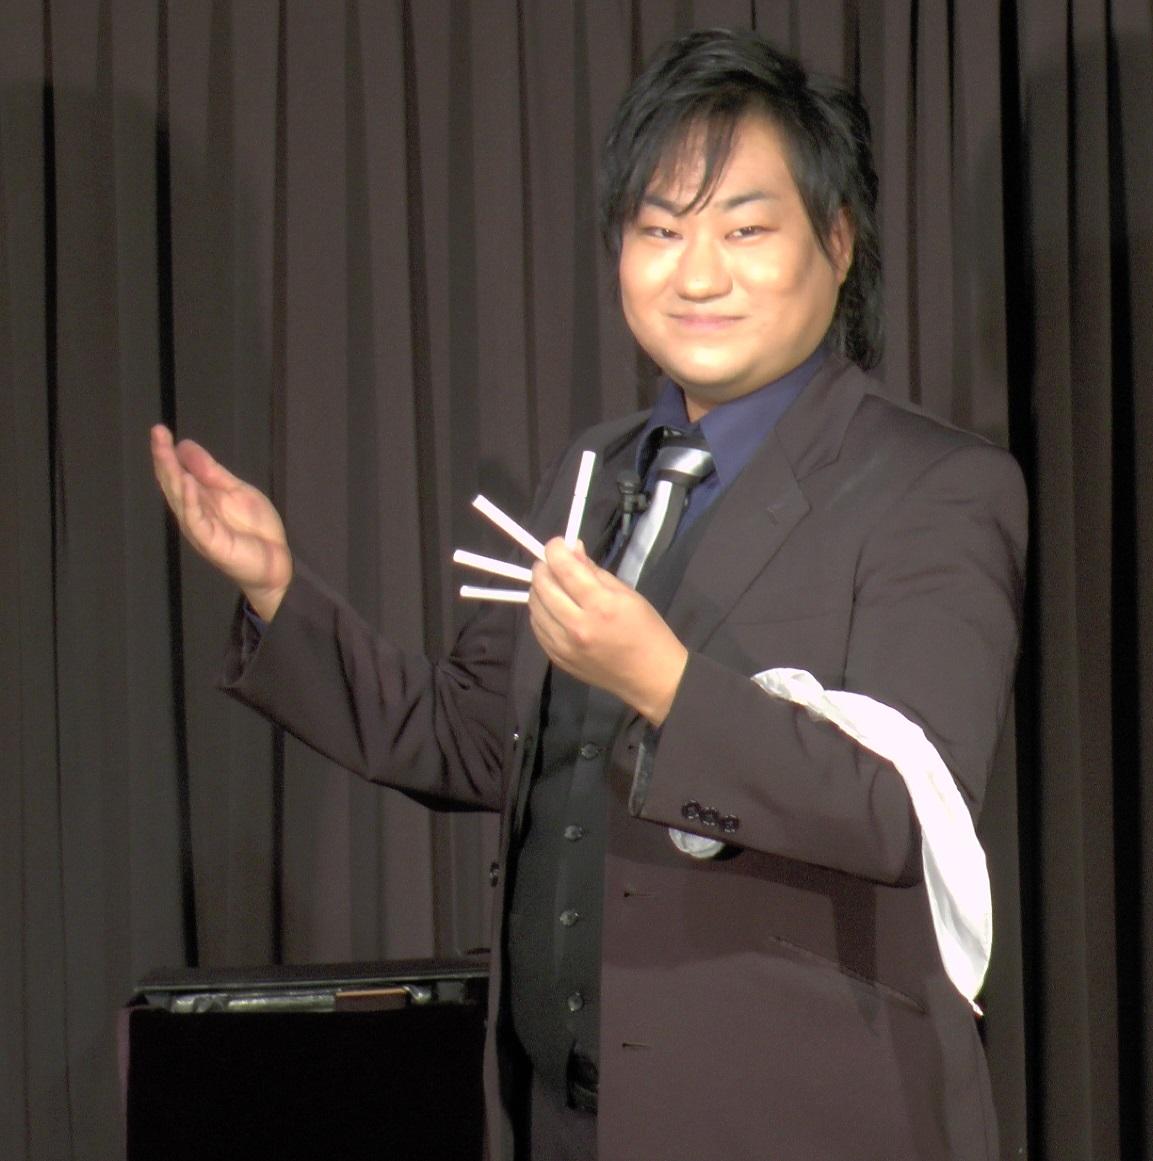 MAGI−PARA(マジックパラダイス)Vol.77 DVD/2枚組み